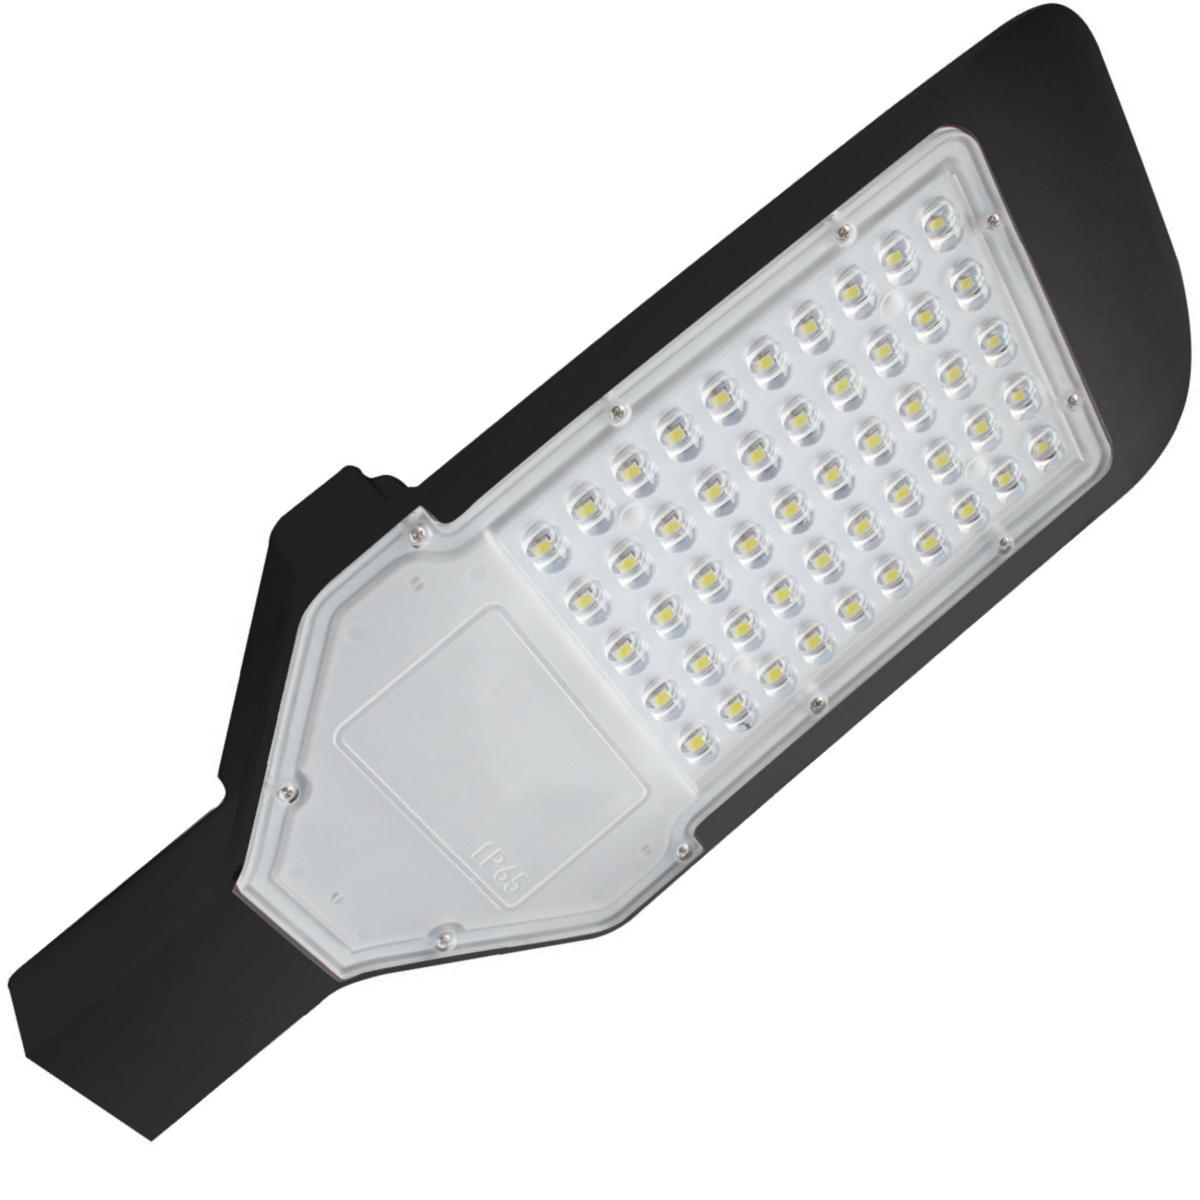 LED Straatlamp - Orny - 50W - Helder/Koud Wit 6400K - Waterdicht IP65 - Mat Zwart - Aluminium